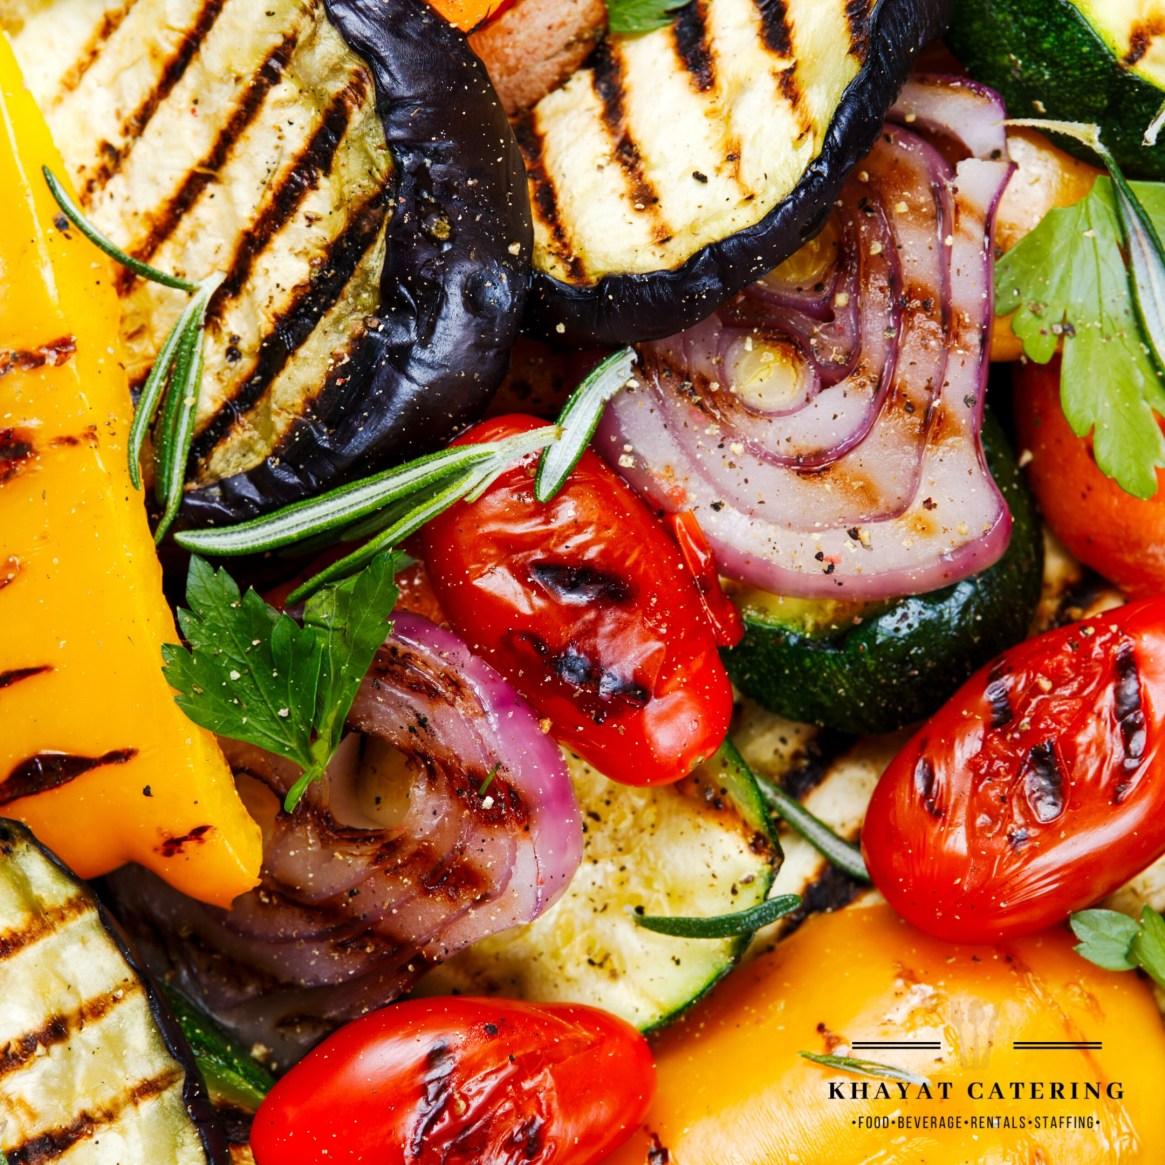 Khayat Catering balsamic grilled vegetables